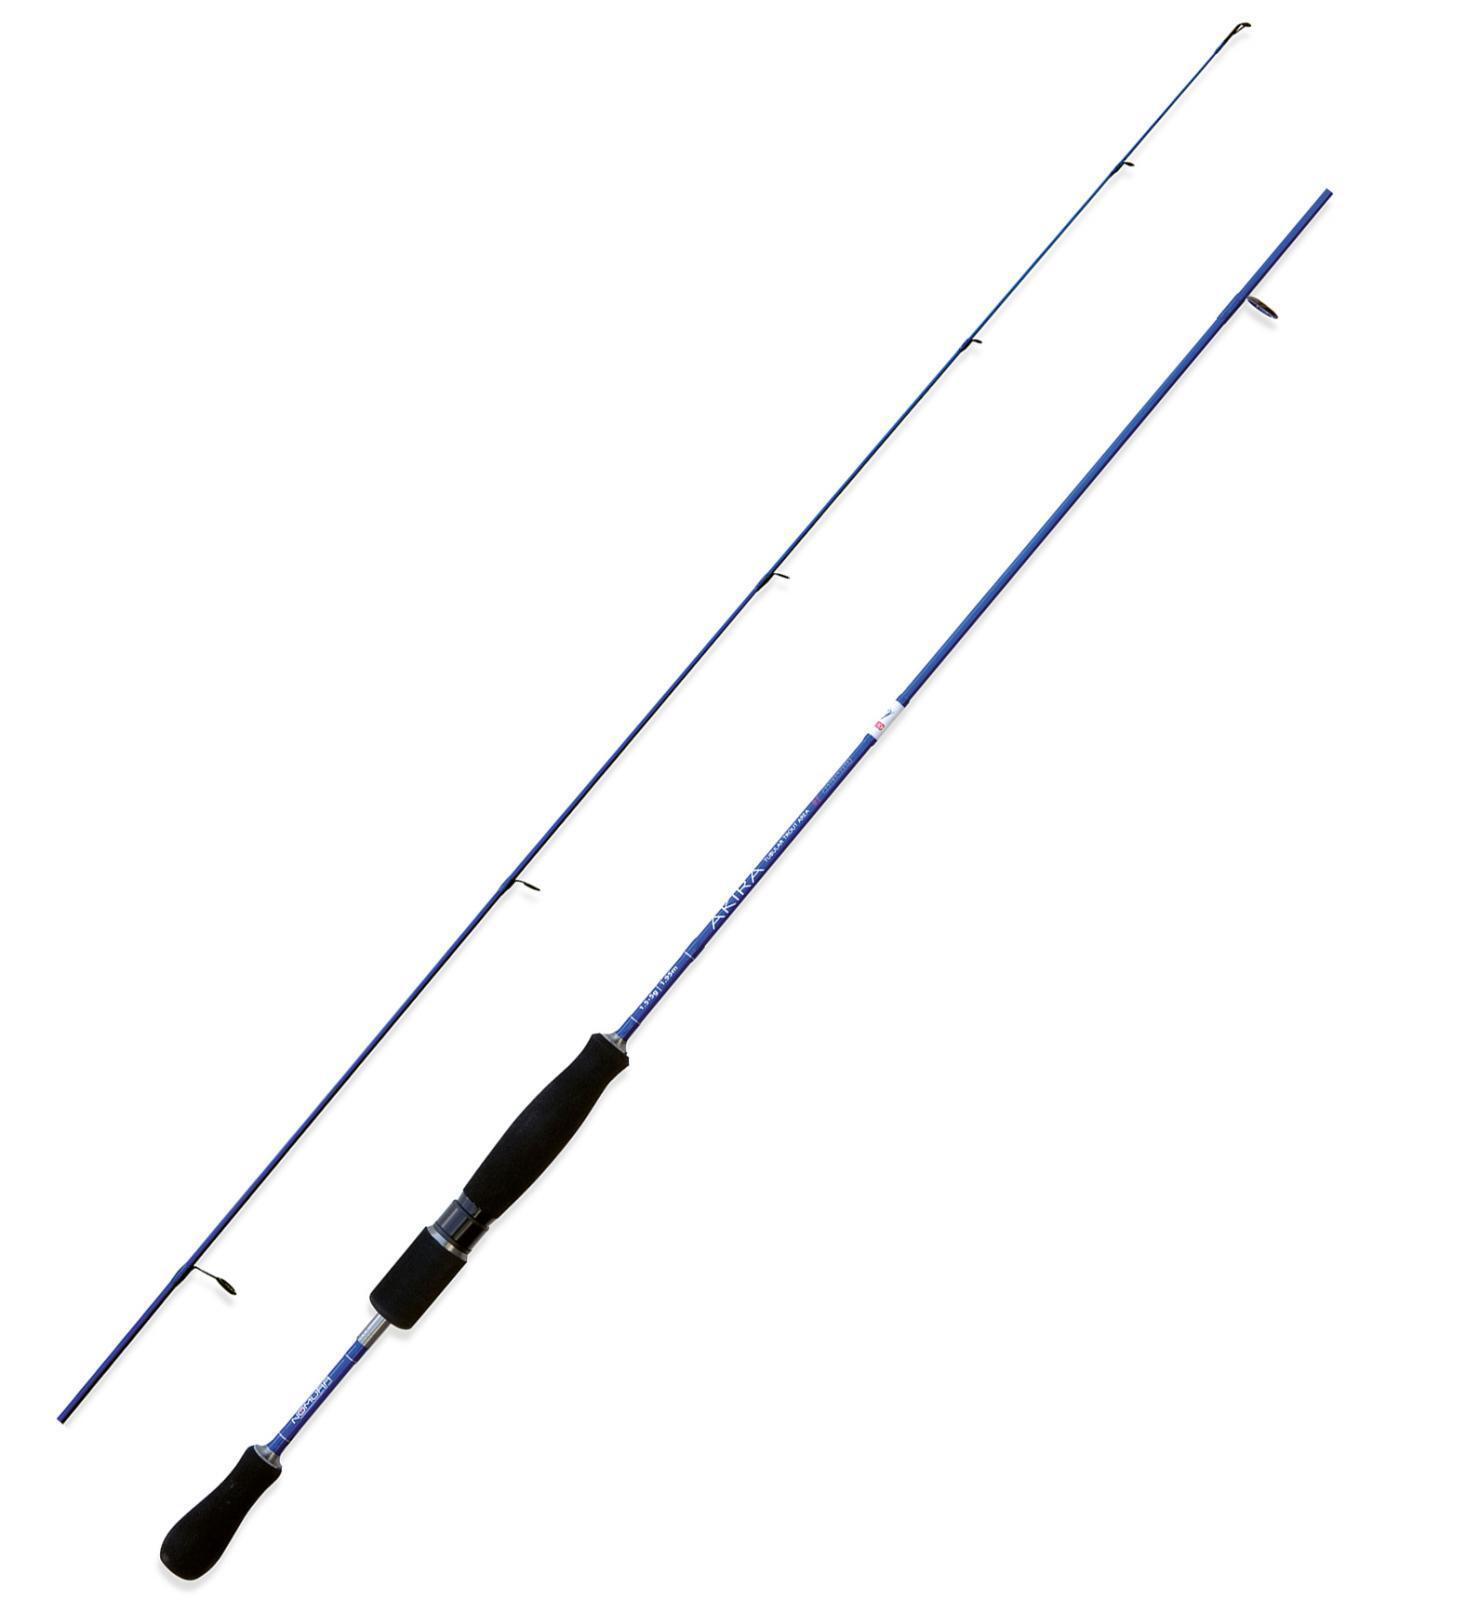 NM20540519 Nomura Canna pesca Trout Area Akira tubolar 195 1,5-5gr     RNG